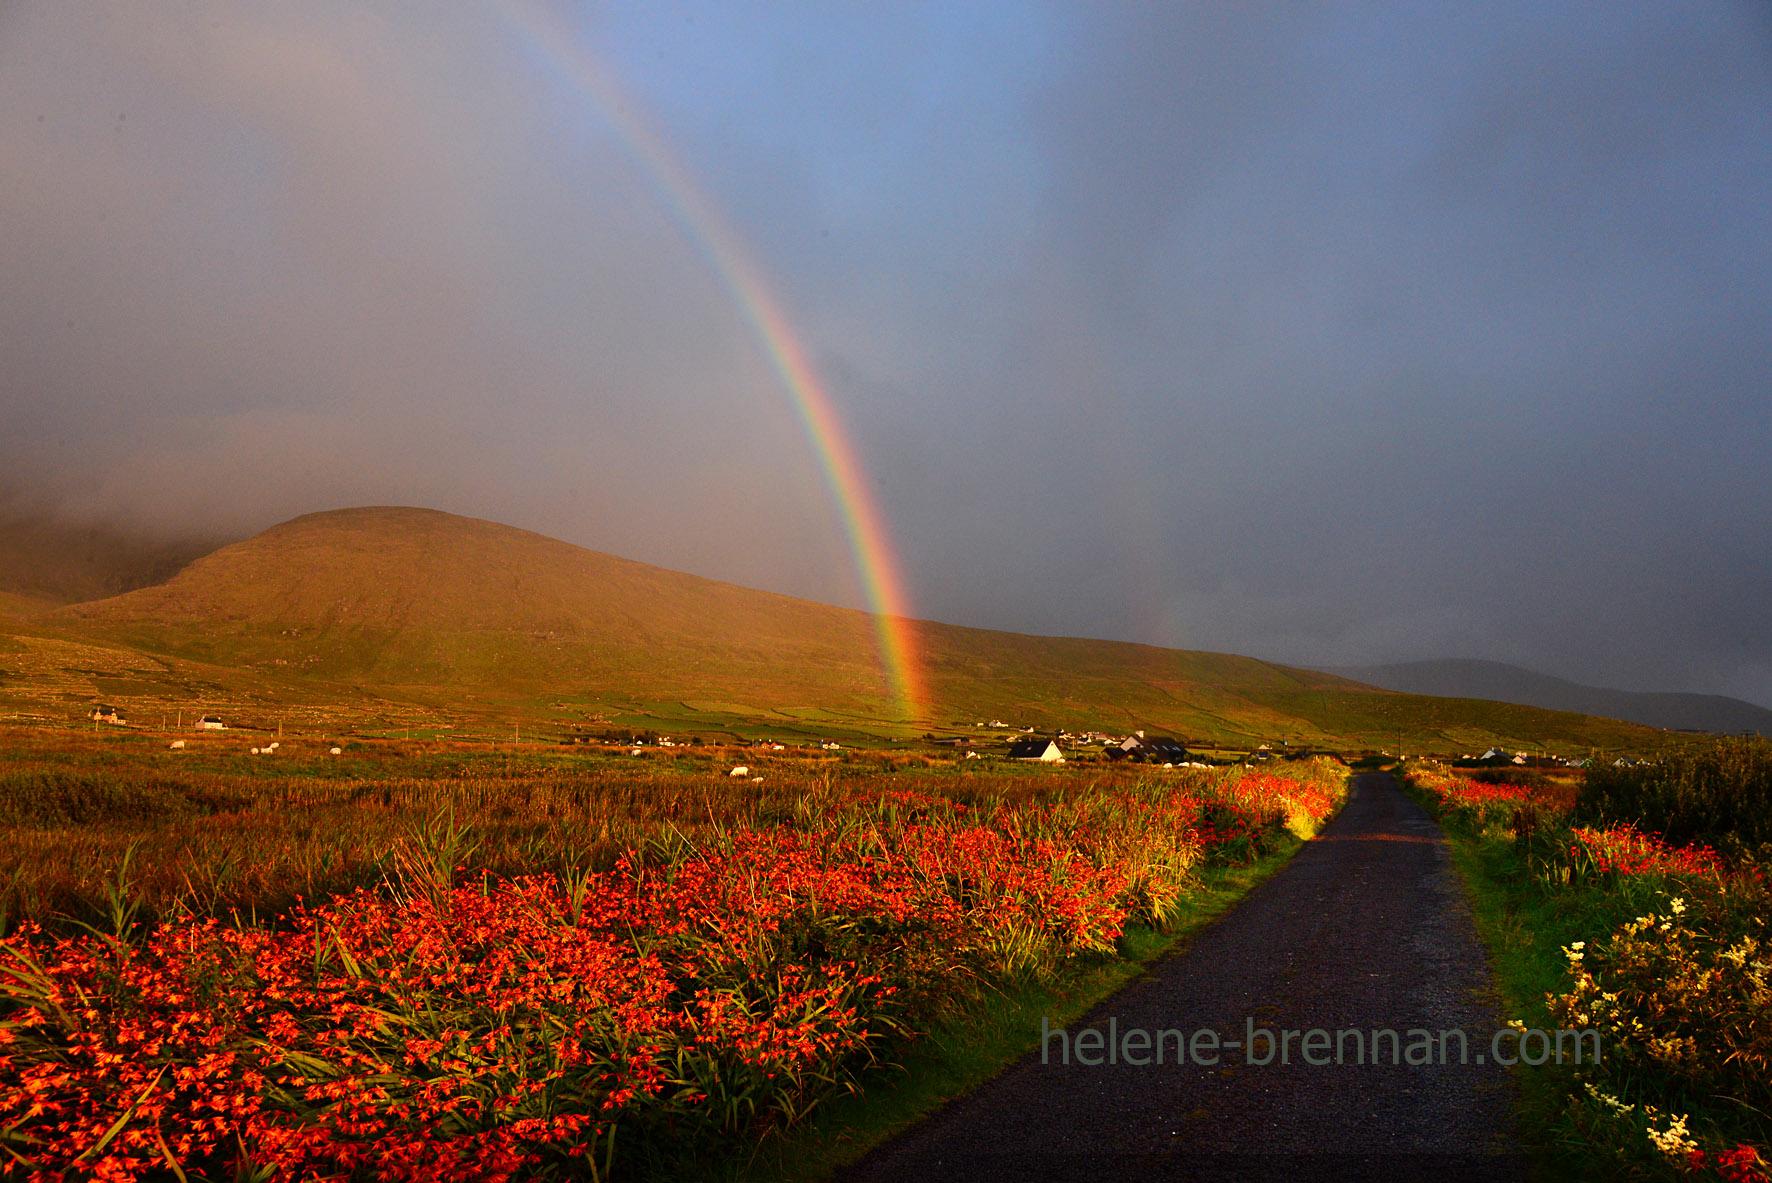 DSC_1574 cuas rainbow and wildflowers